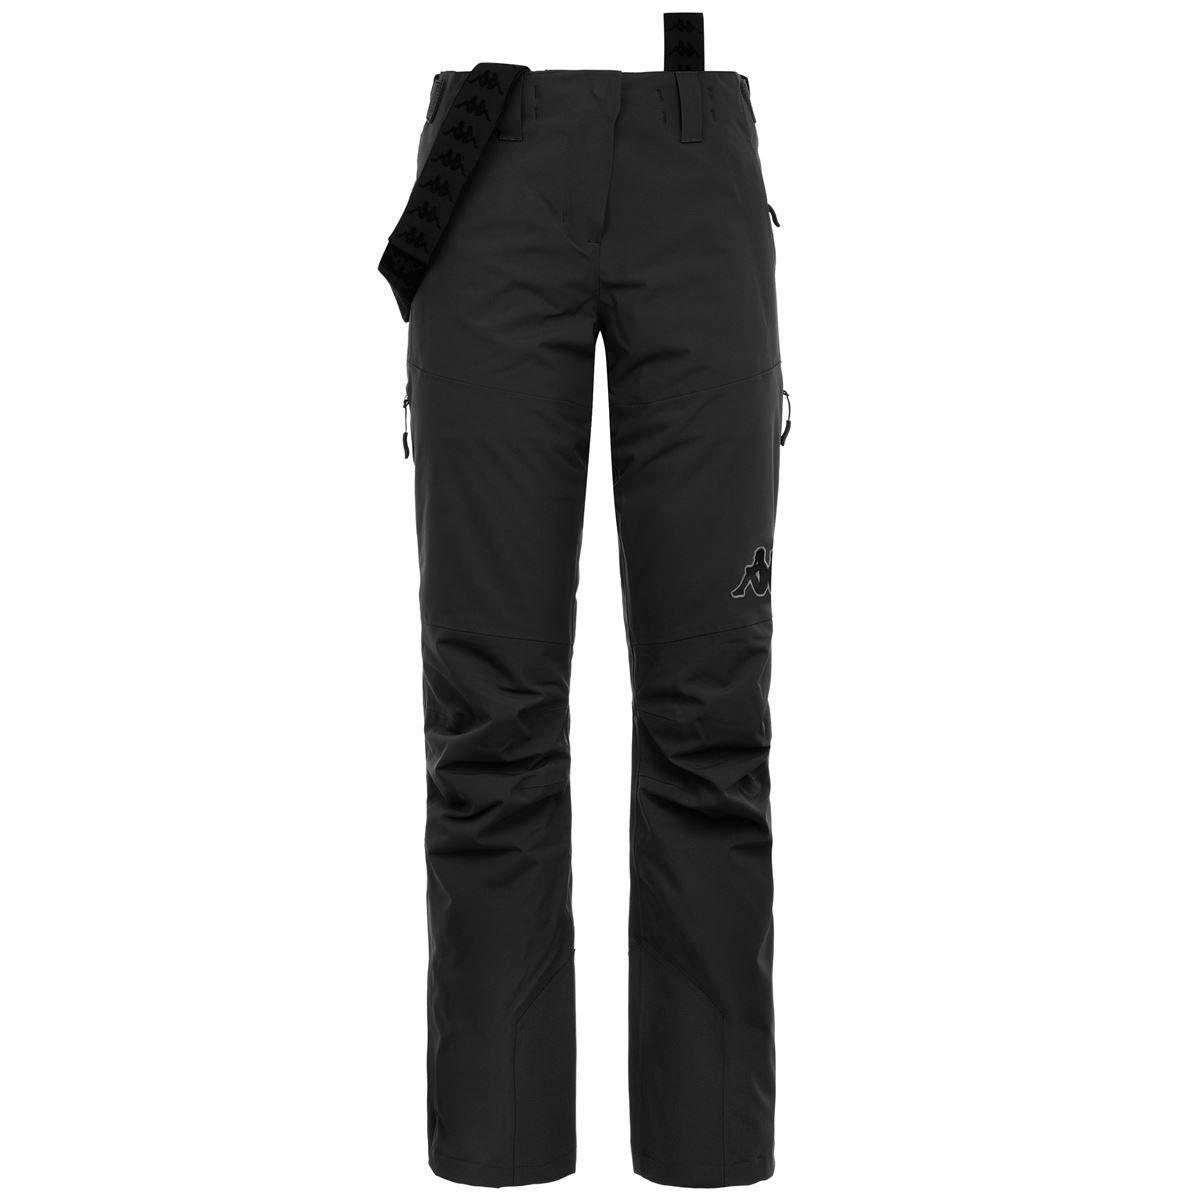 Water Protection Colore Nero Kappa Pantaloni Imbottiti Donna Modello 6Cento 665